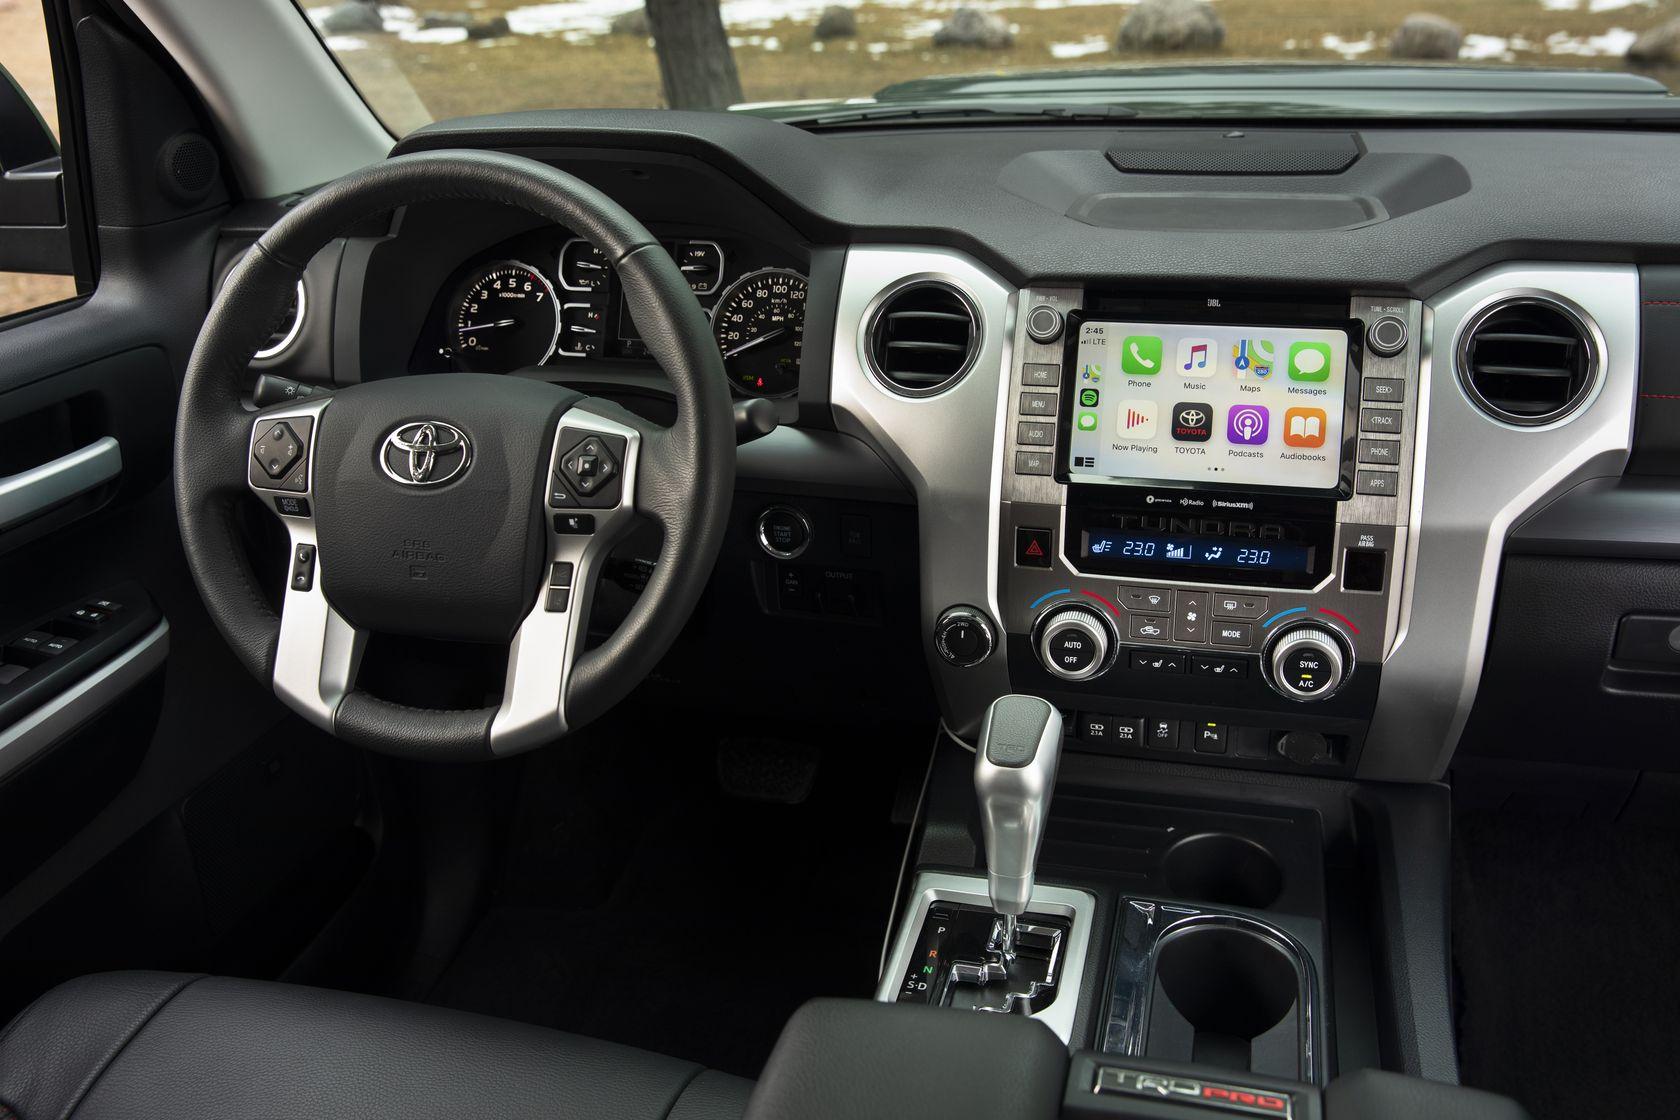 Intérieur du Toyota Tundra 2020